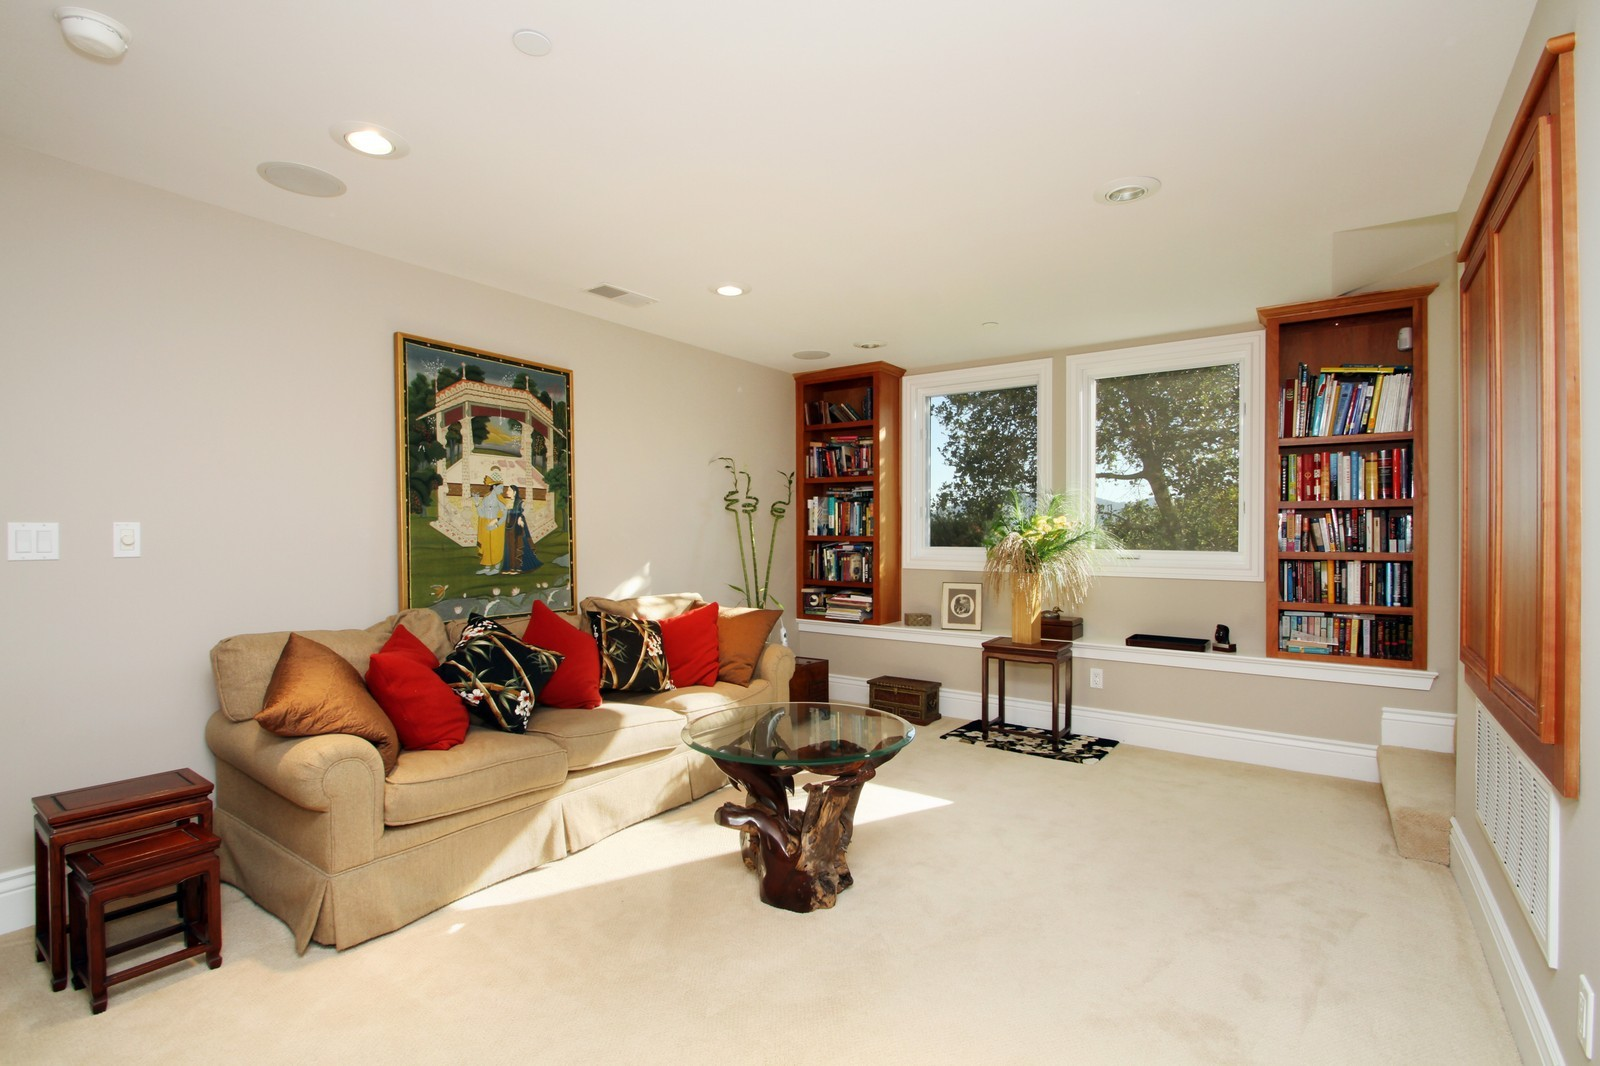 Real Estate Photography - 73 Upper Toyon Drive, Kentfield, CA, 94904 - Bonus Room